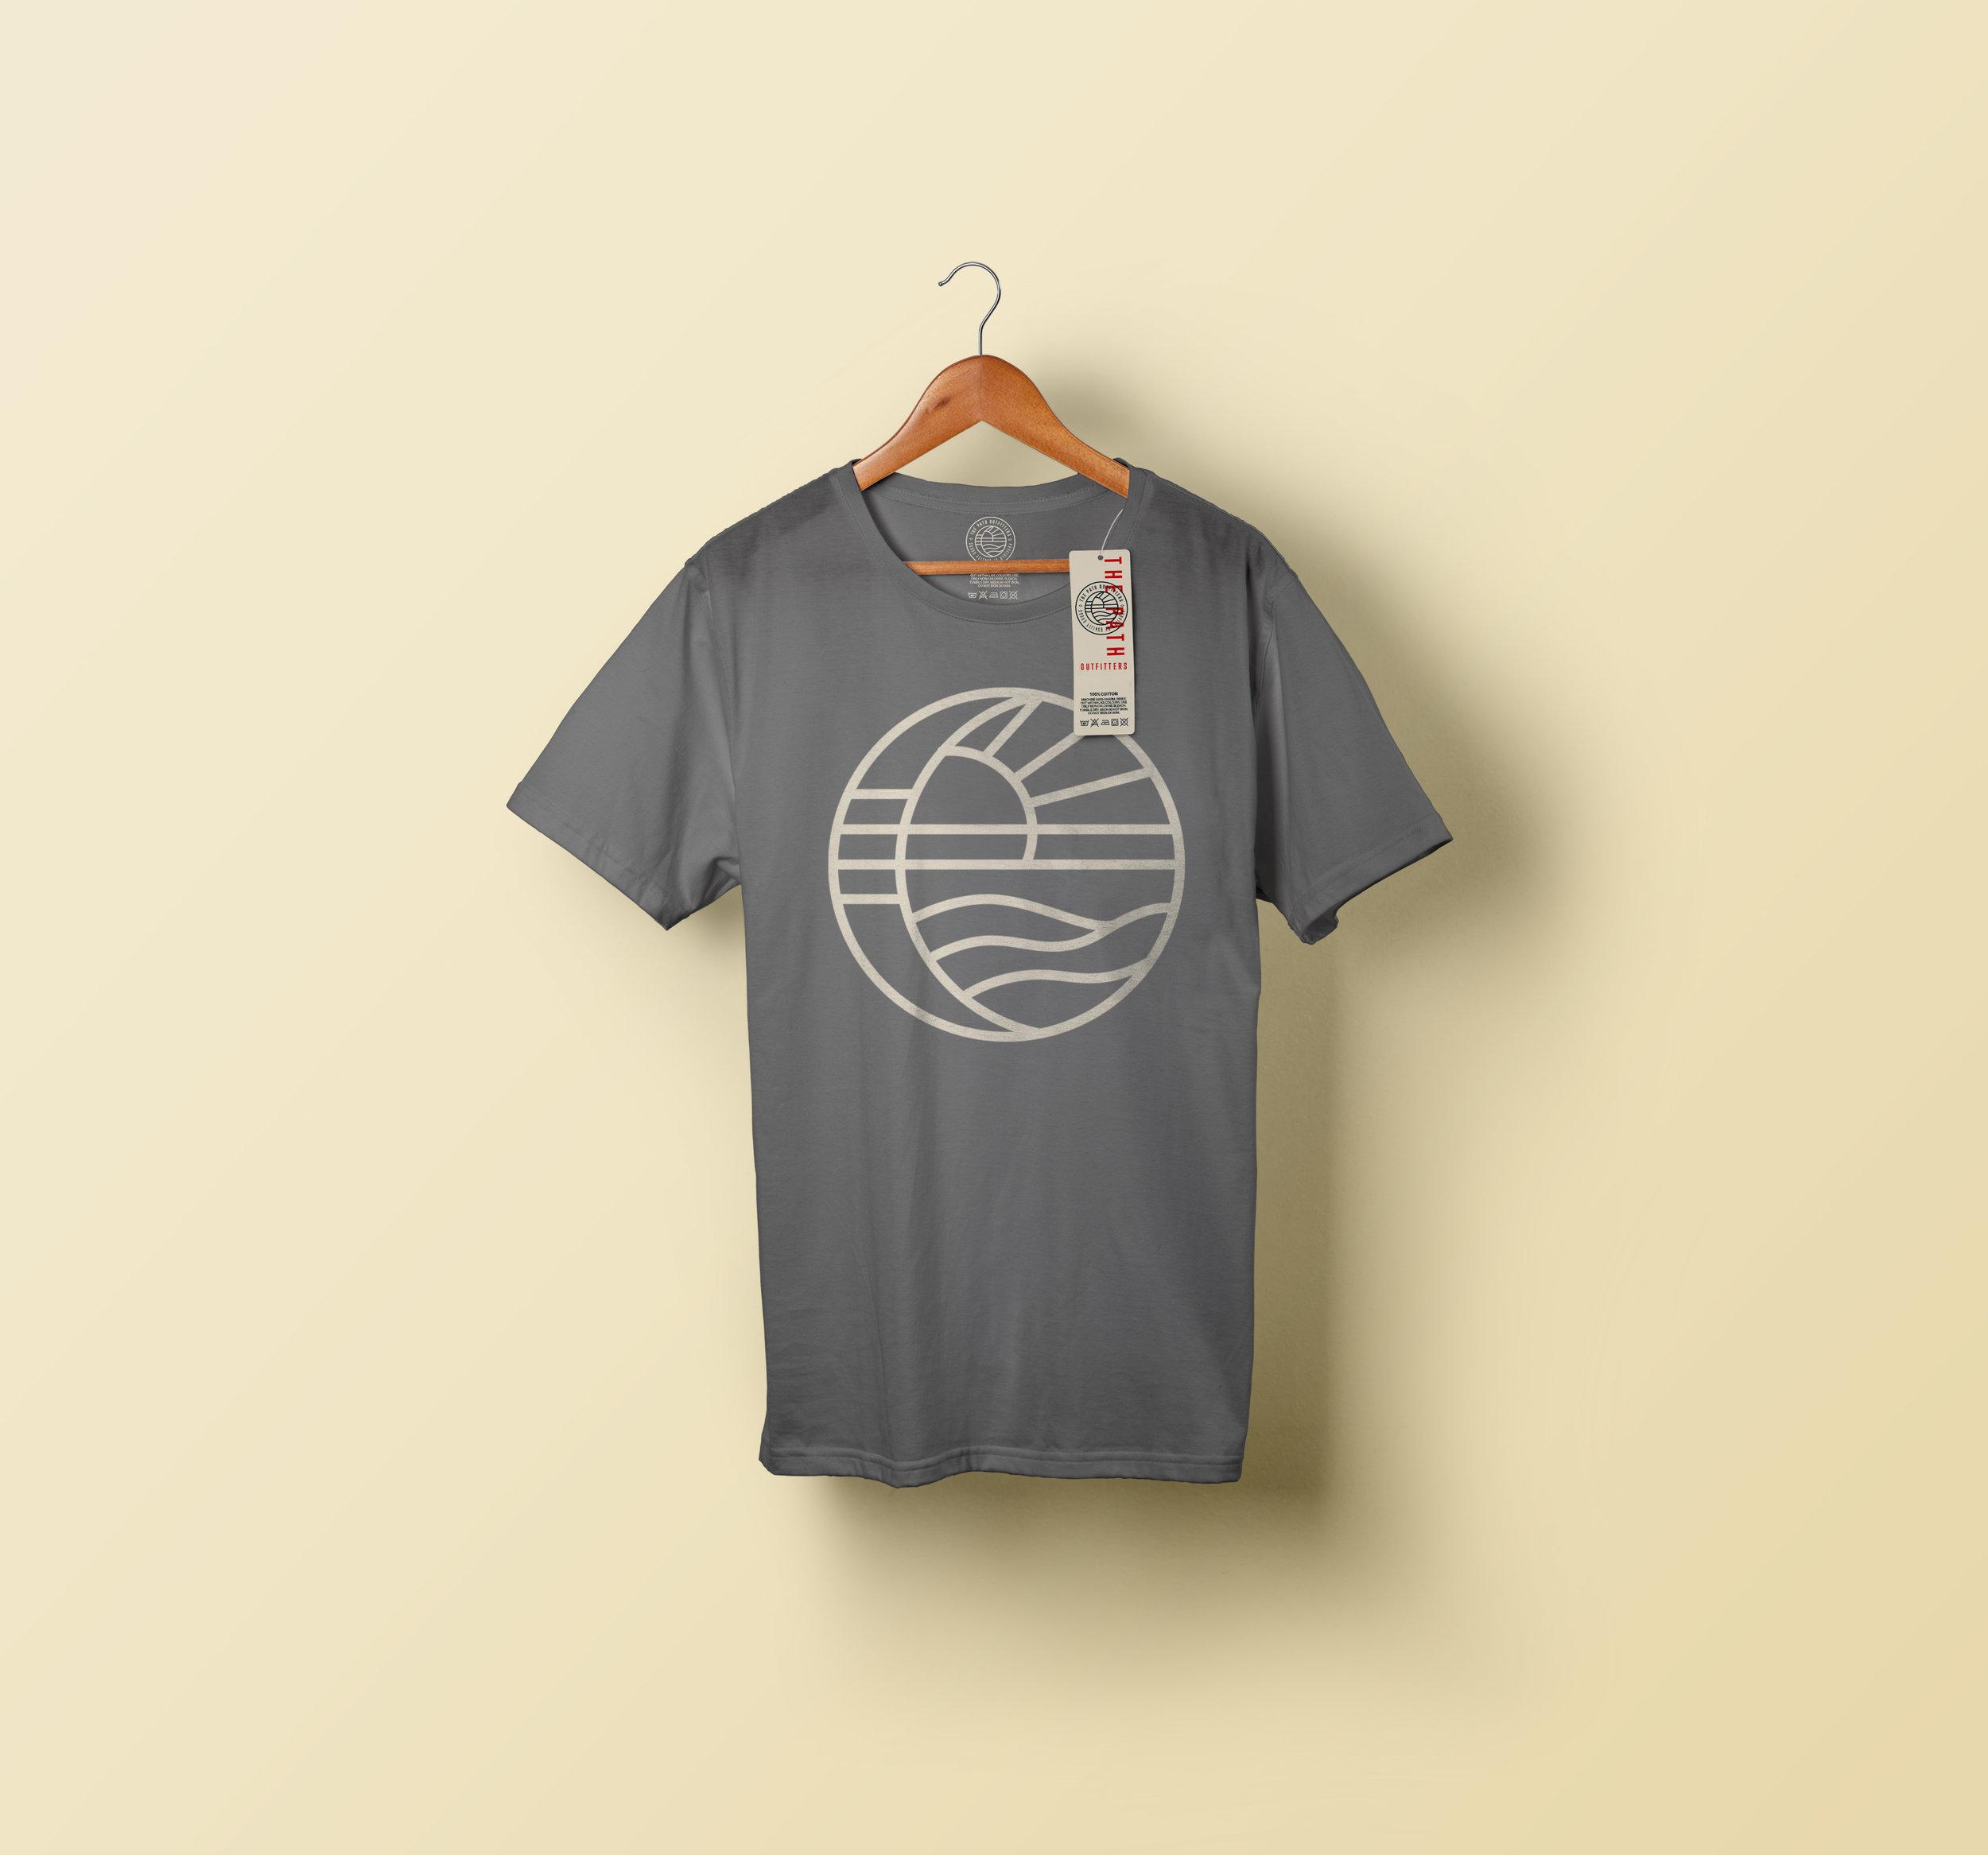 T-Shirt-Hanging-Mockup-B-v1.jpg